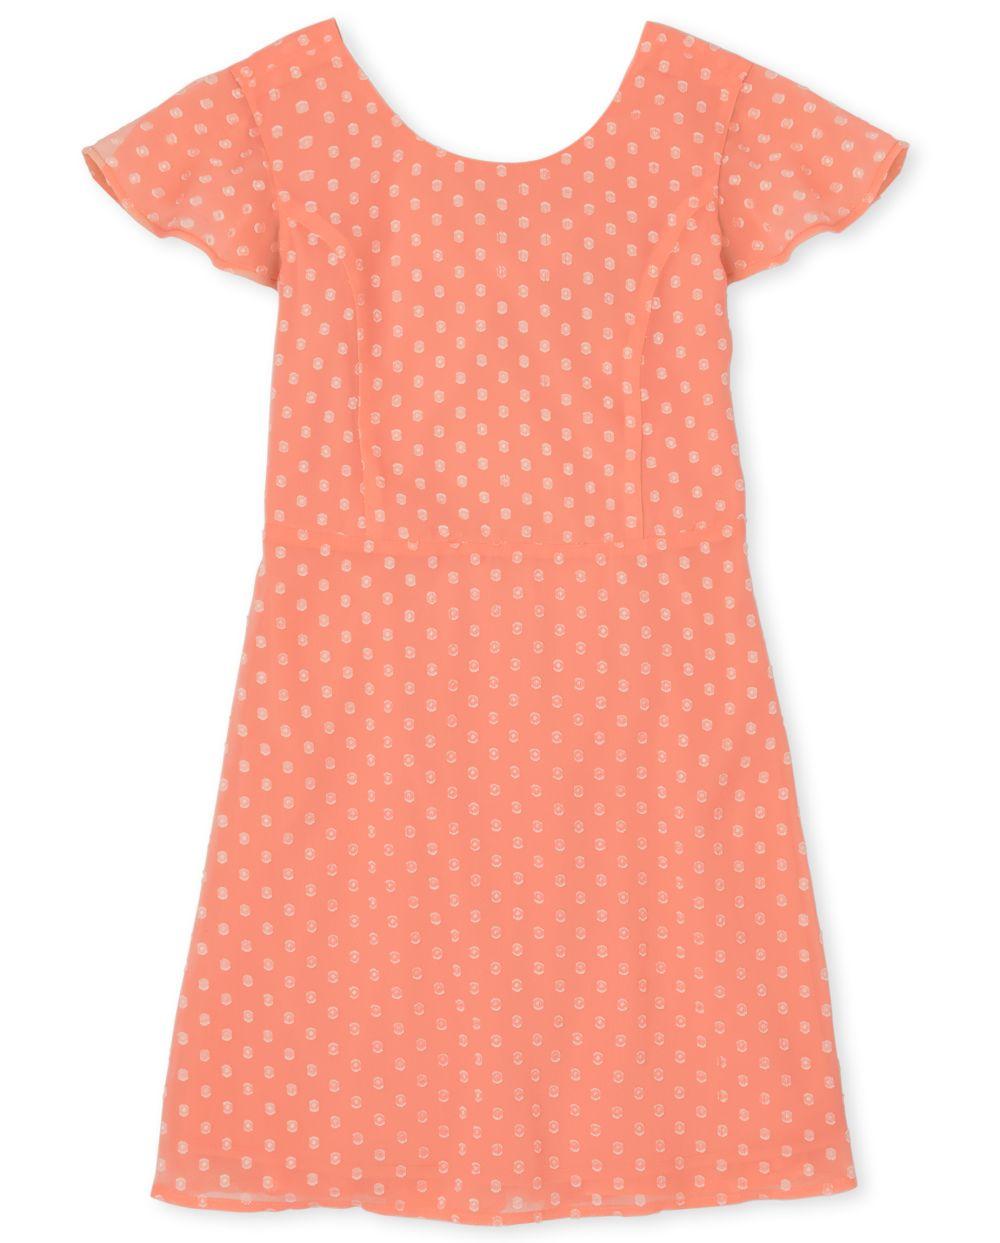 Girls Clip Dot Ruffle Dress - Orange